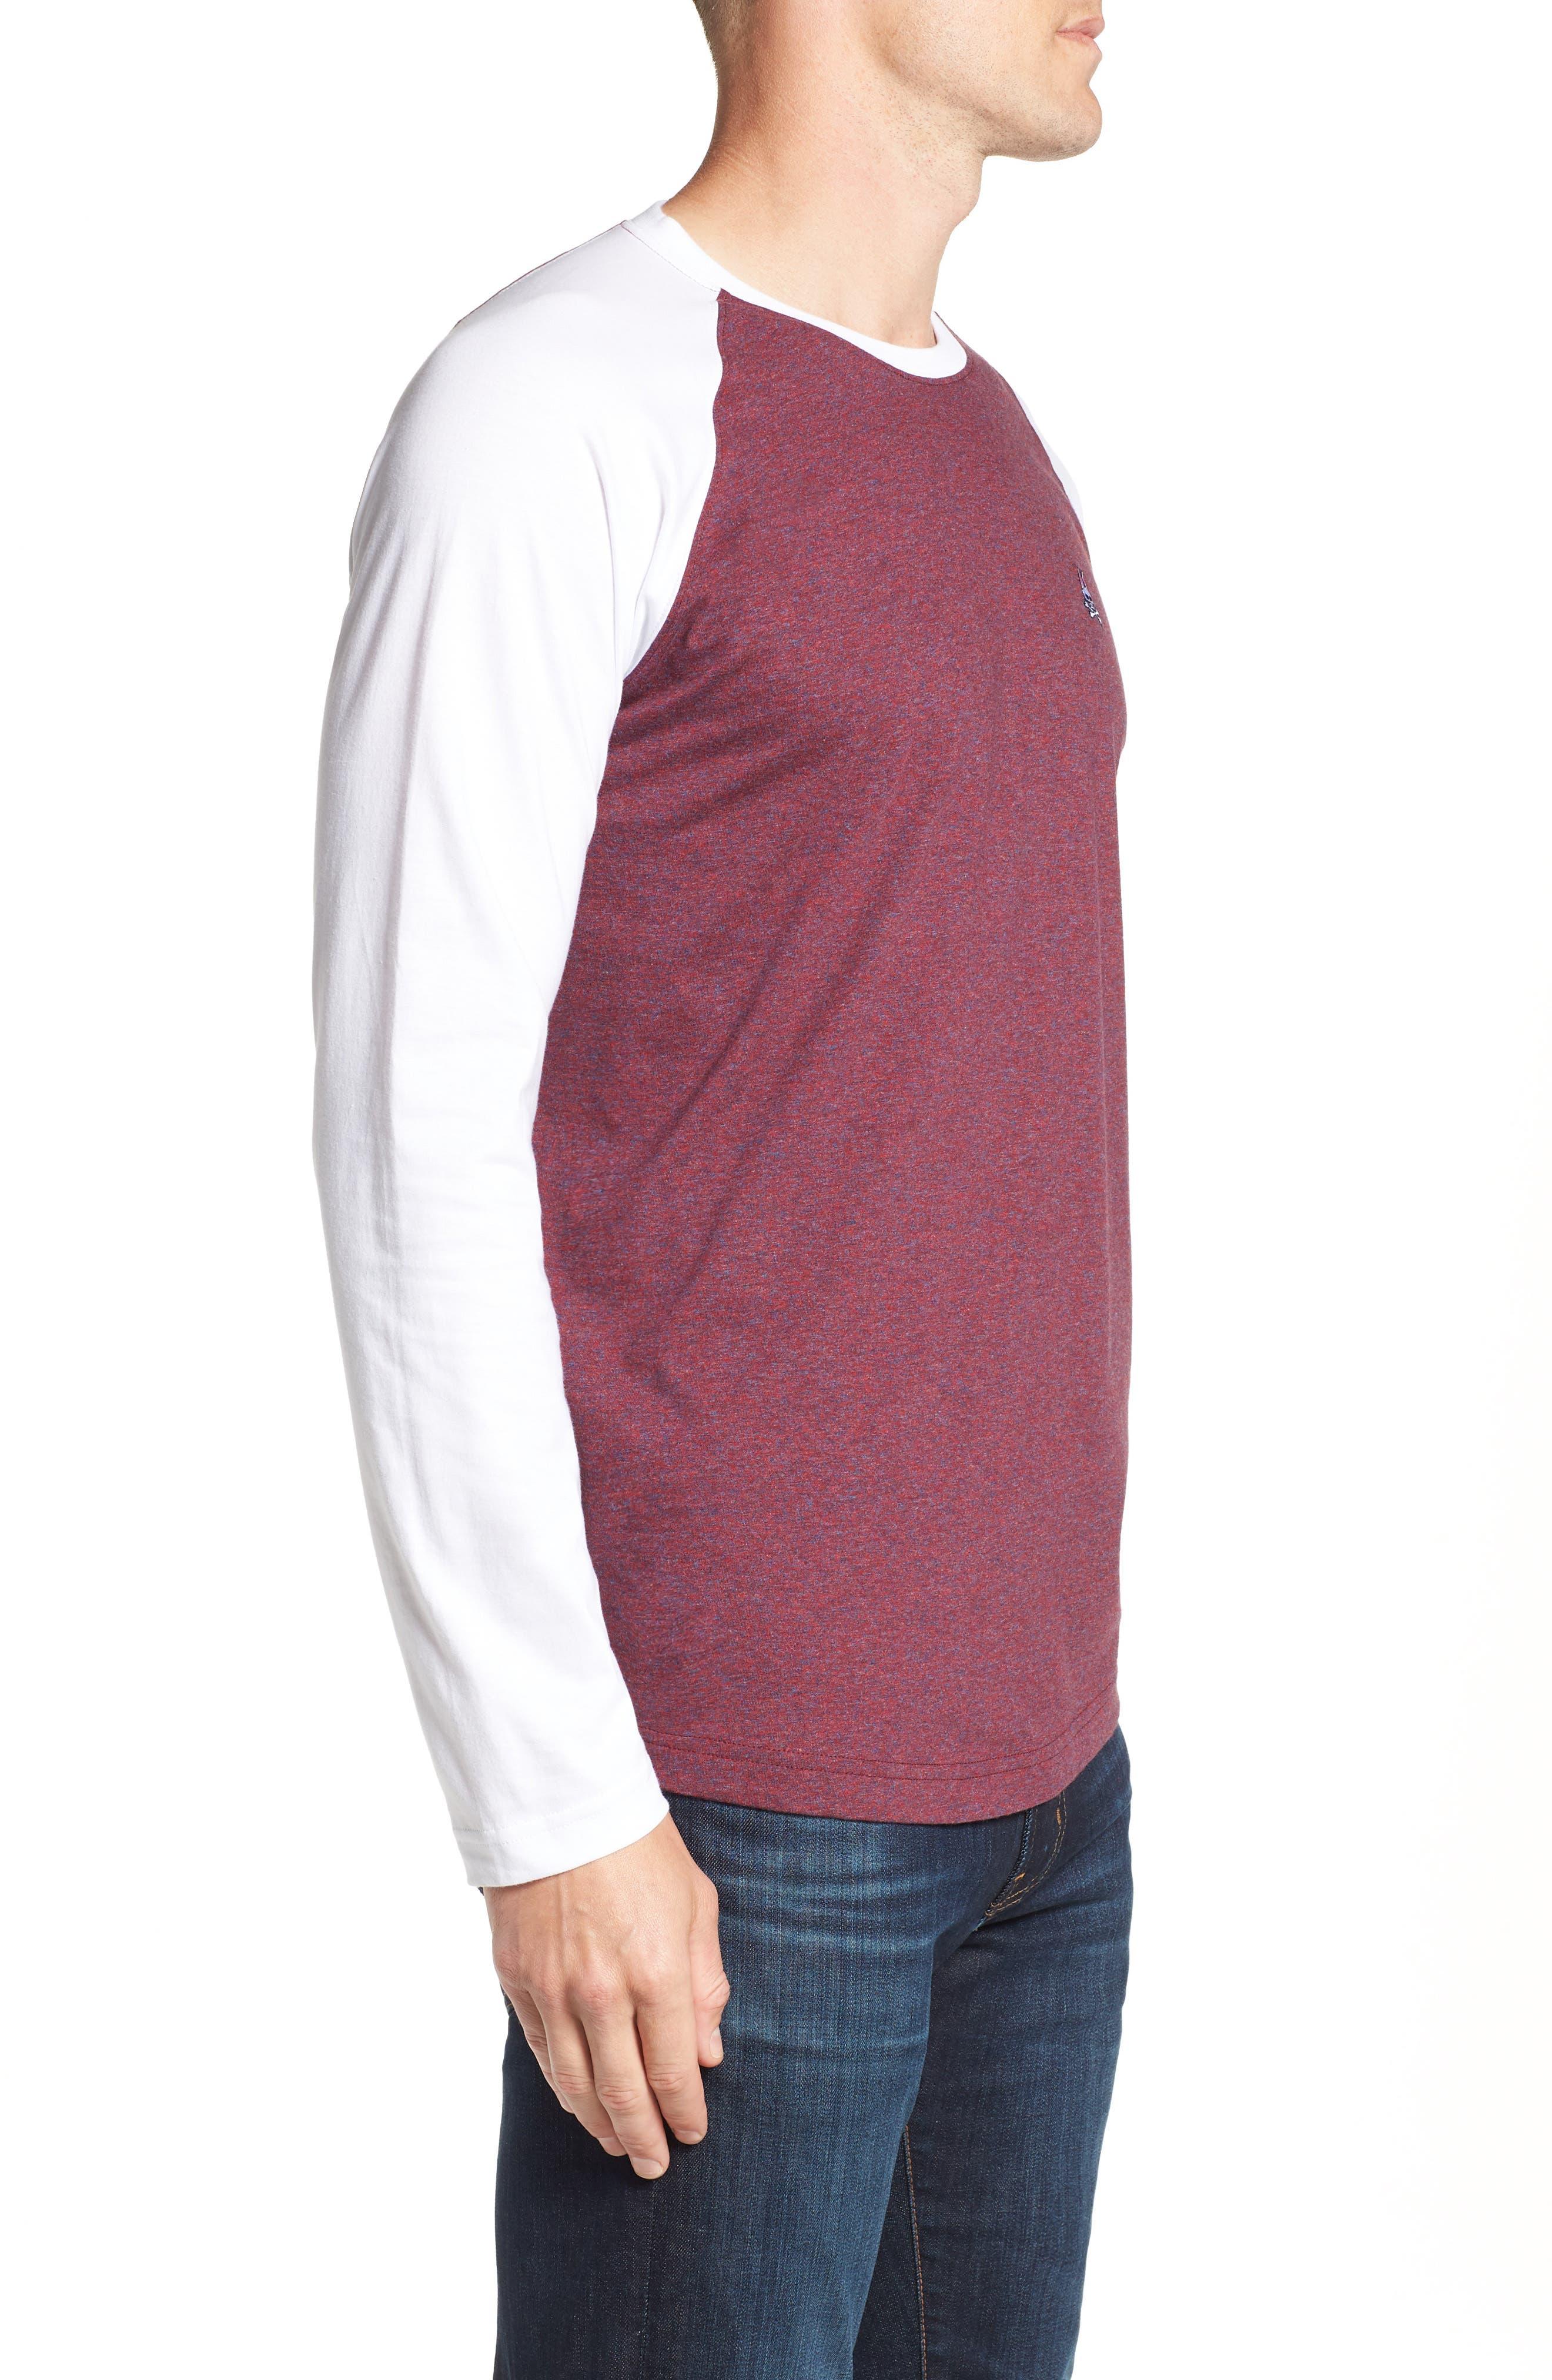 Cobb Raglan T-Shirt,                             Alternate thumbnail 3, color,                             BURGUNDY SALT PEPPER